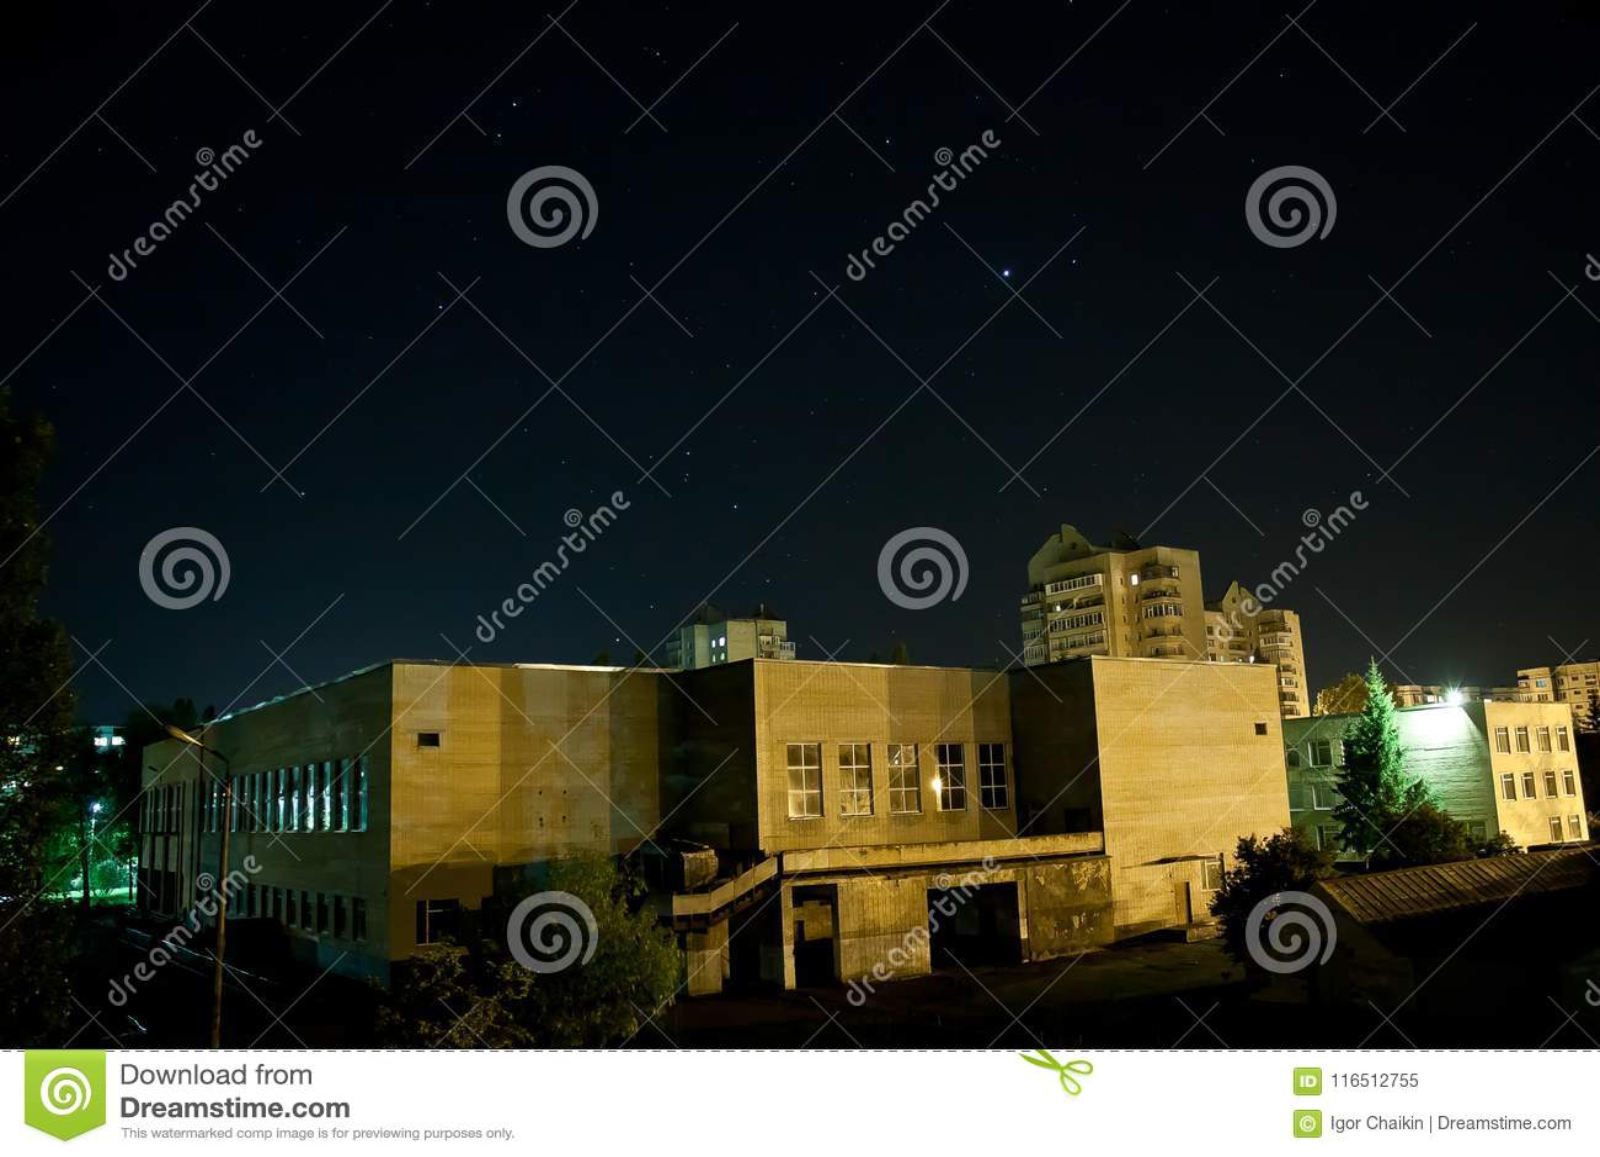 starry sky on the night city stock image image of tree sunset